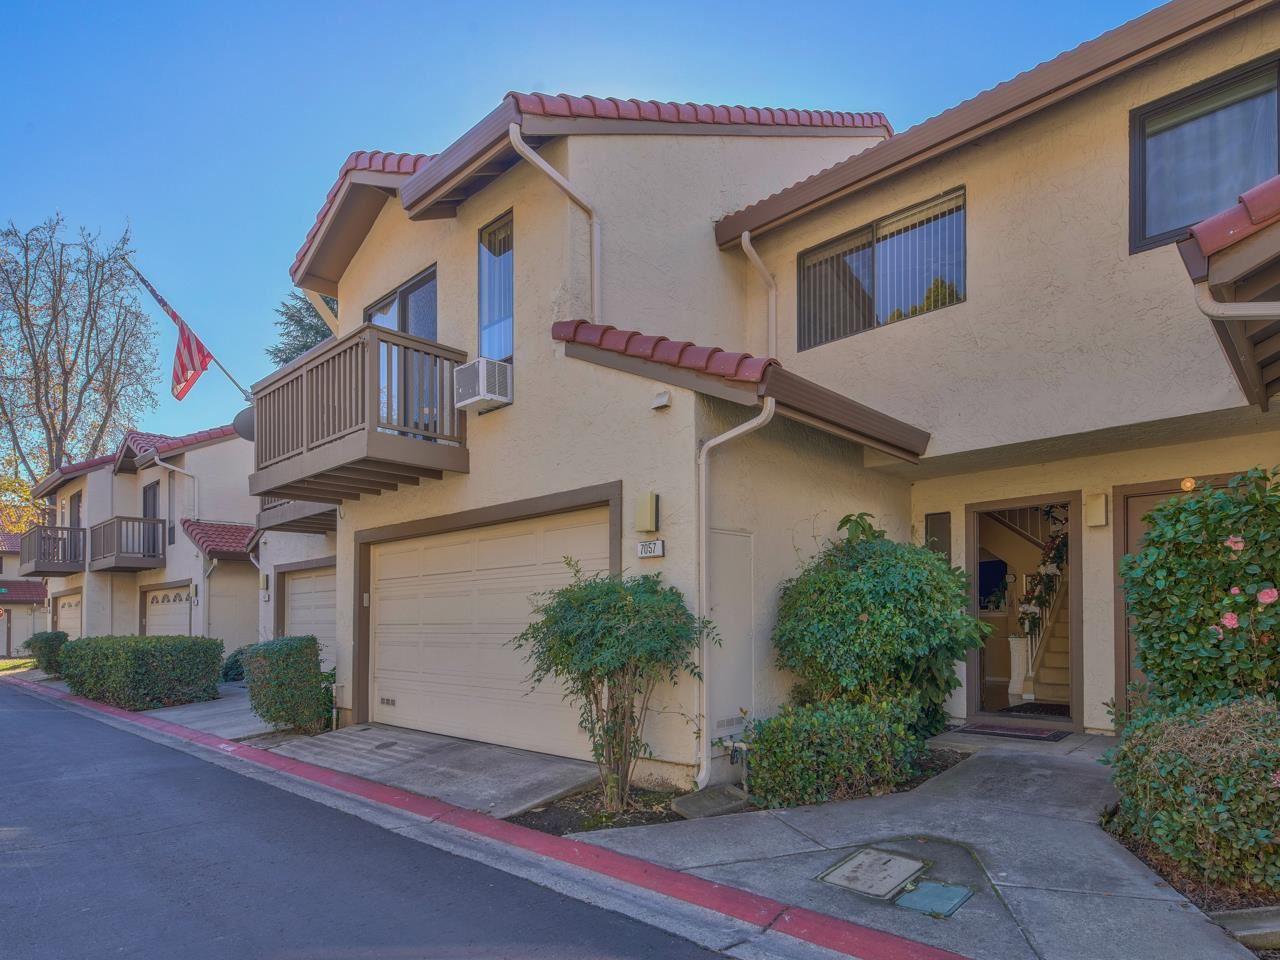 Photo for 7057 Mount Vernon WAY, GILROY, CA 95020 (MLS # ML81824475)